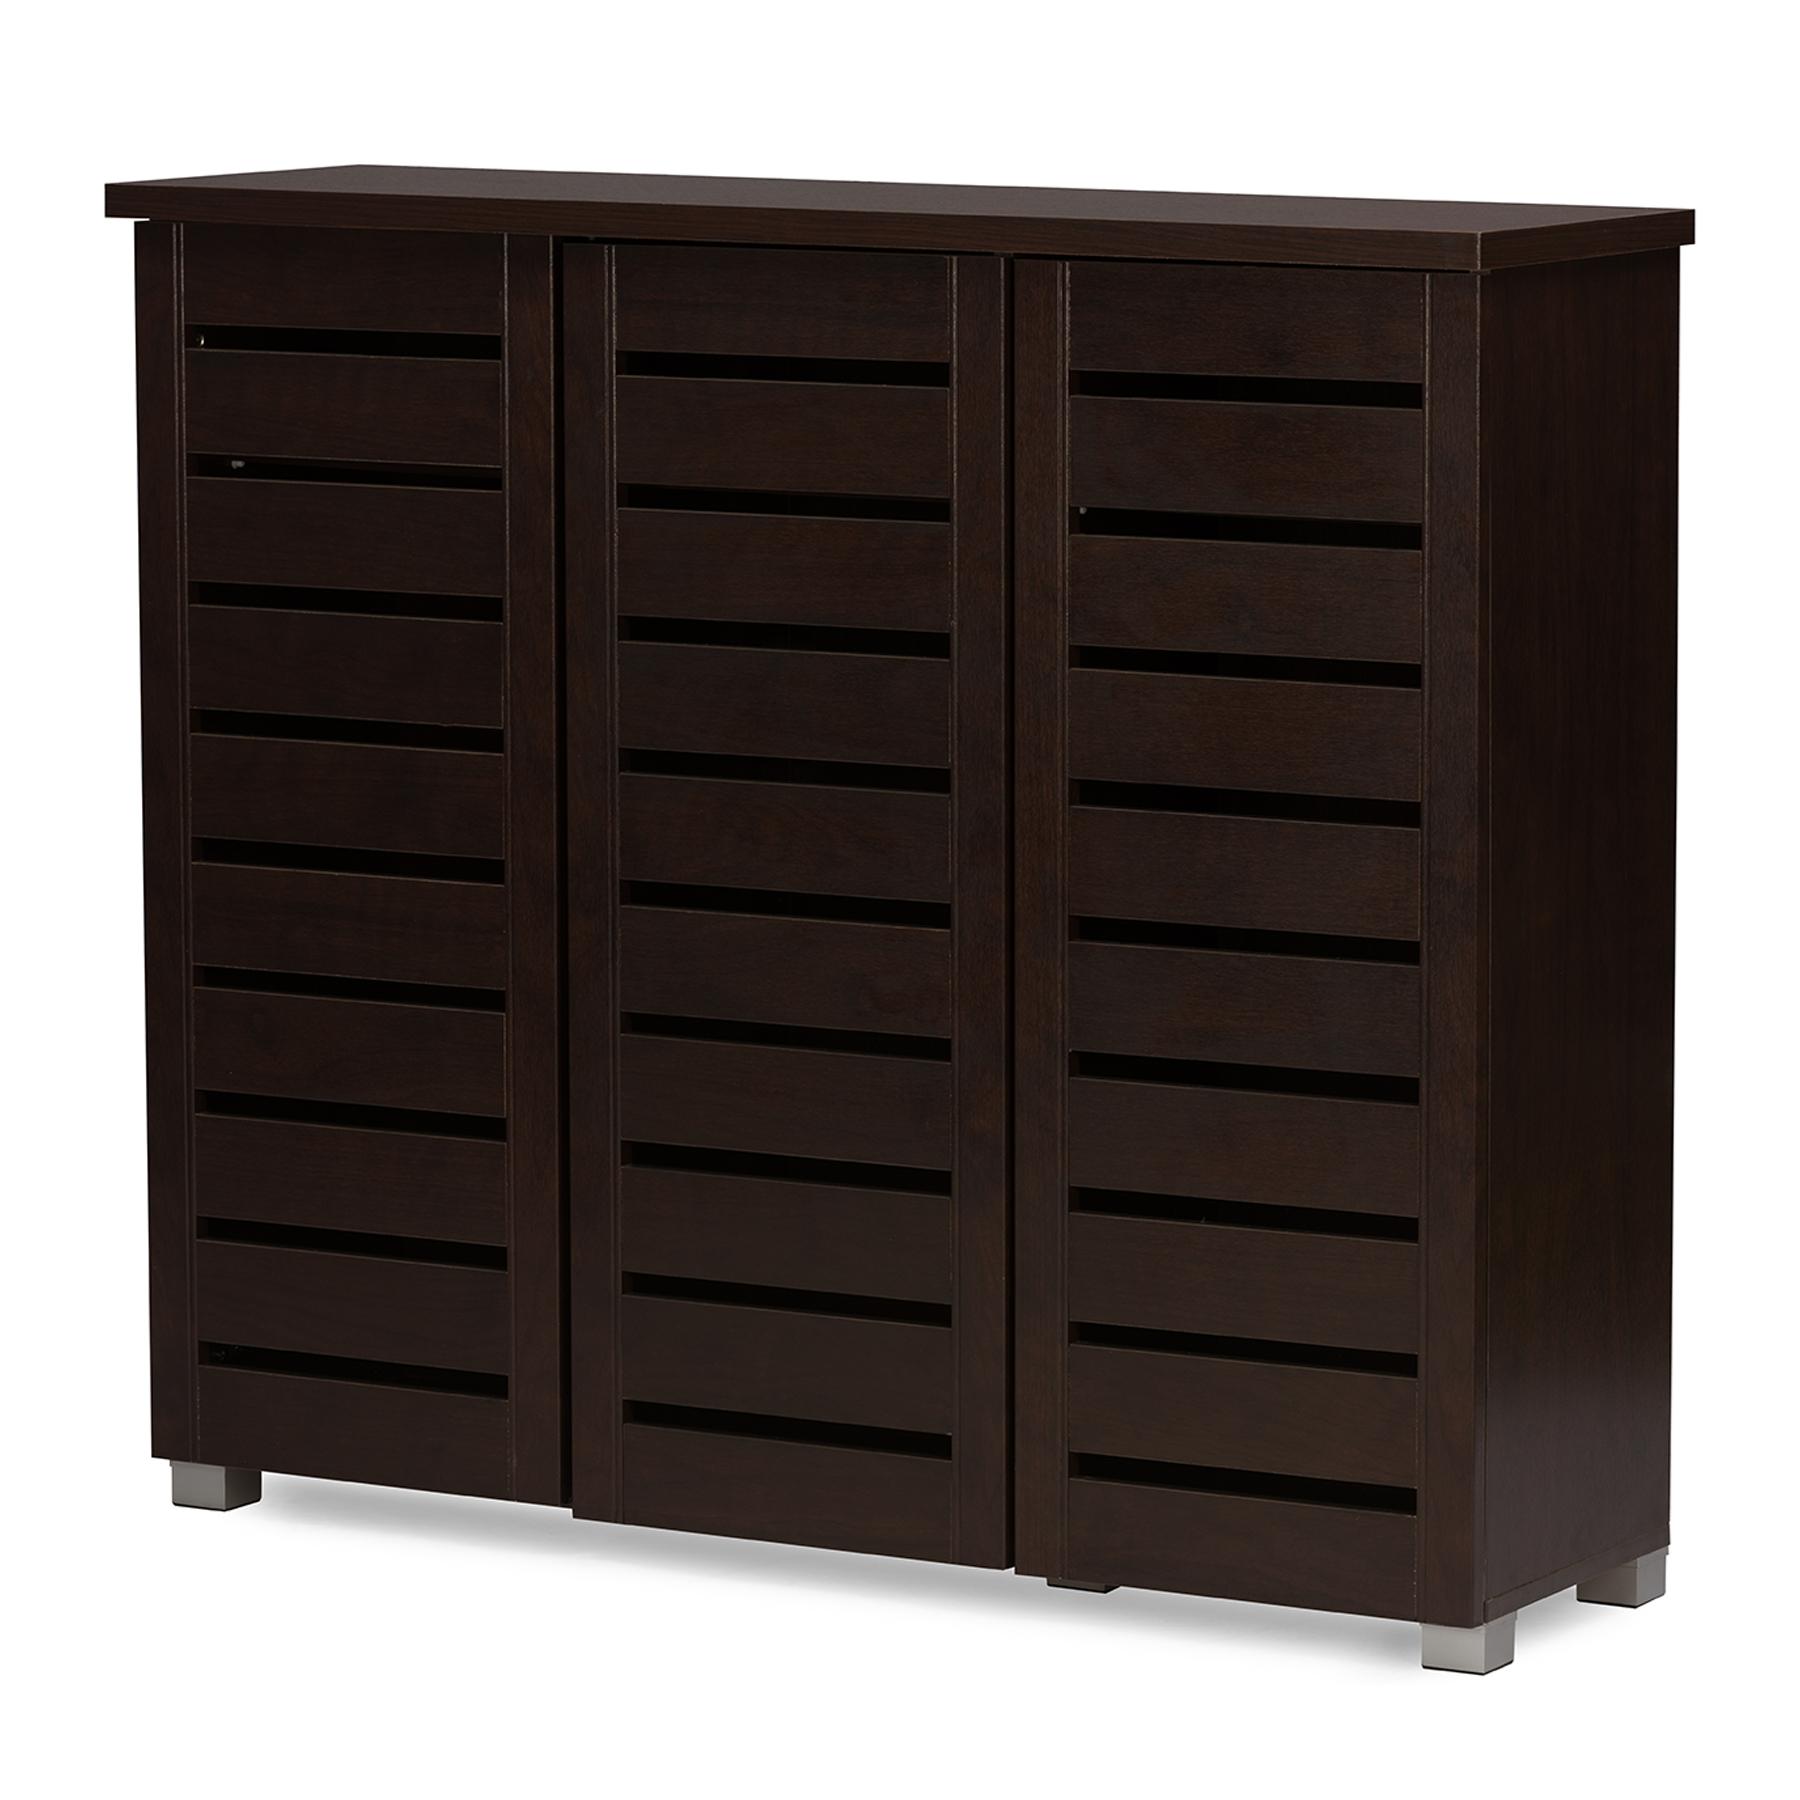 ... Baxton Studio Adalwin Modern And Contemporary 3 Door Dark Brown Wooden  Entryway Shoes Storage Cabinet ...